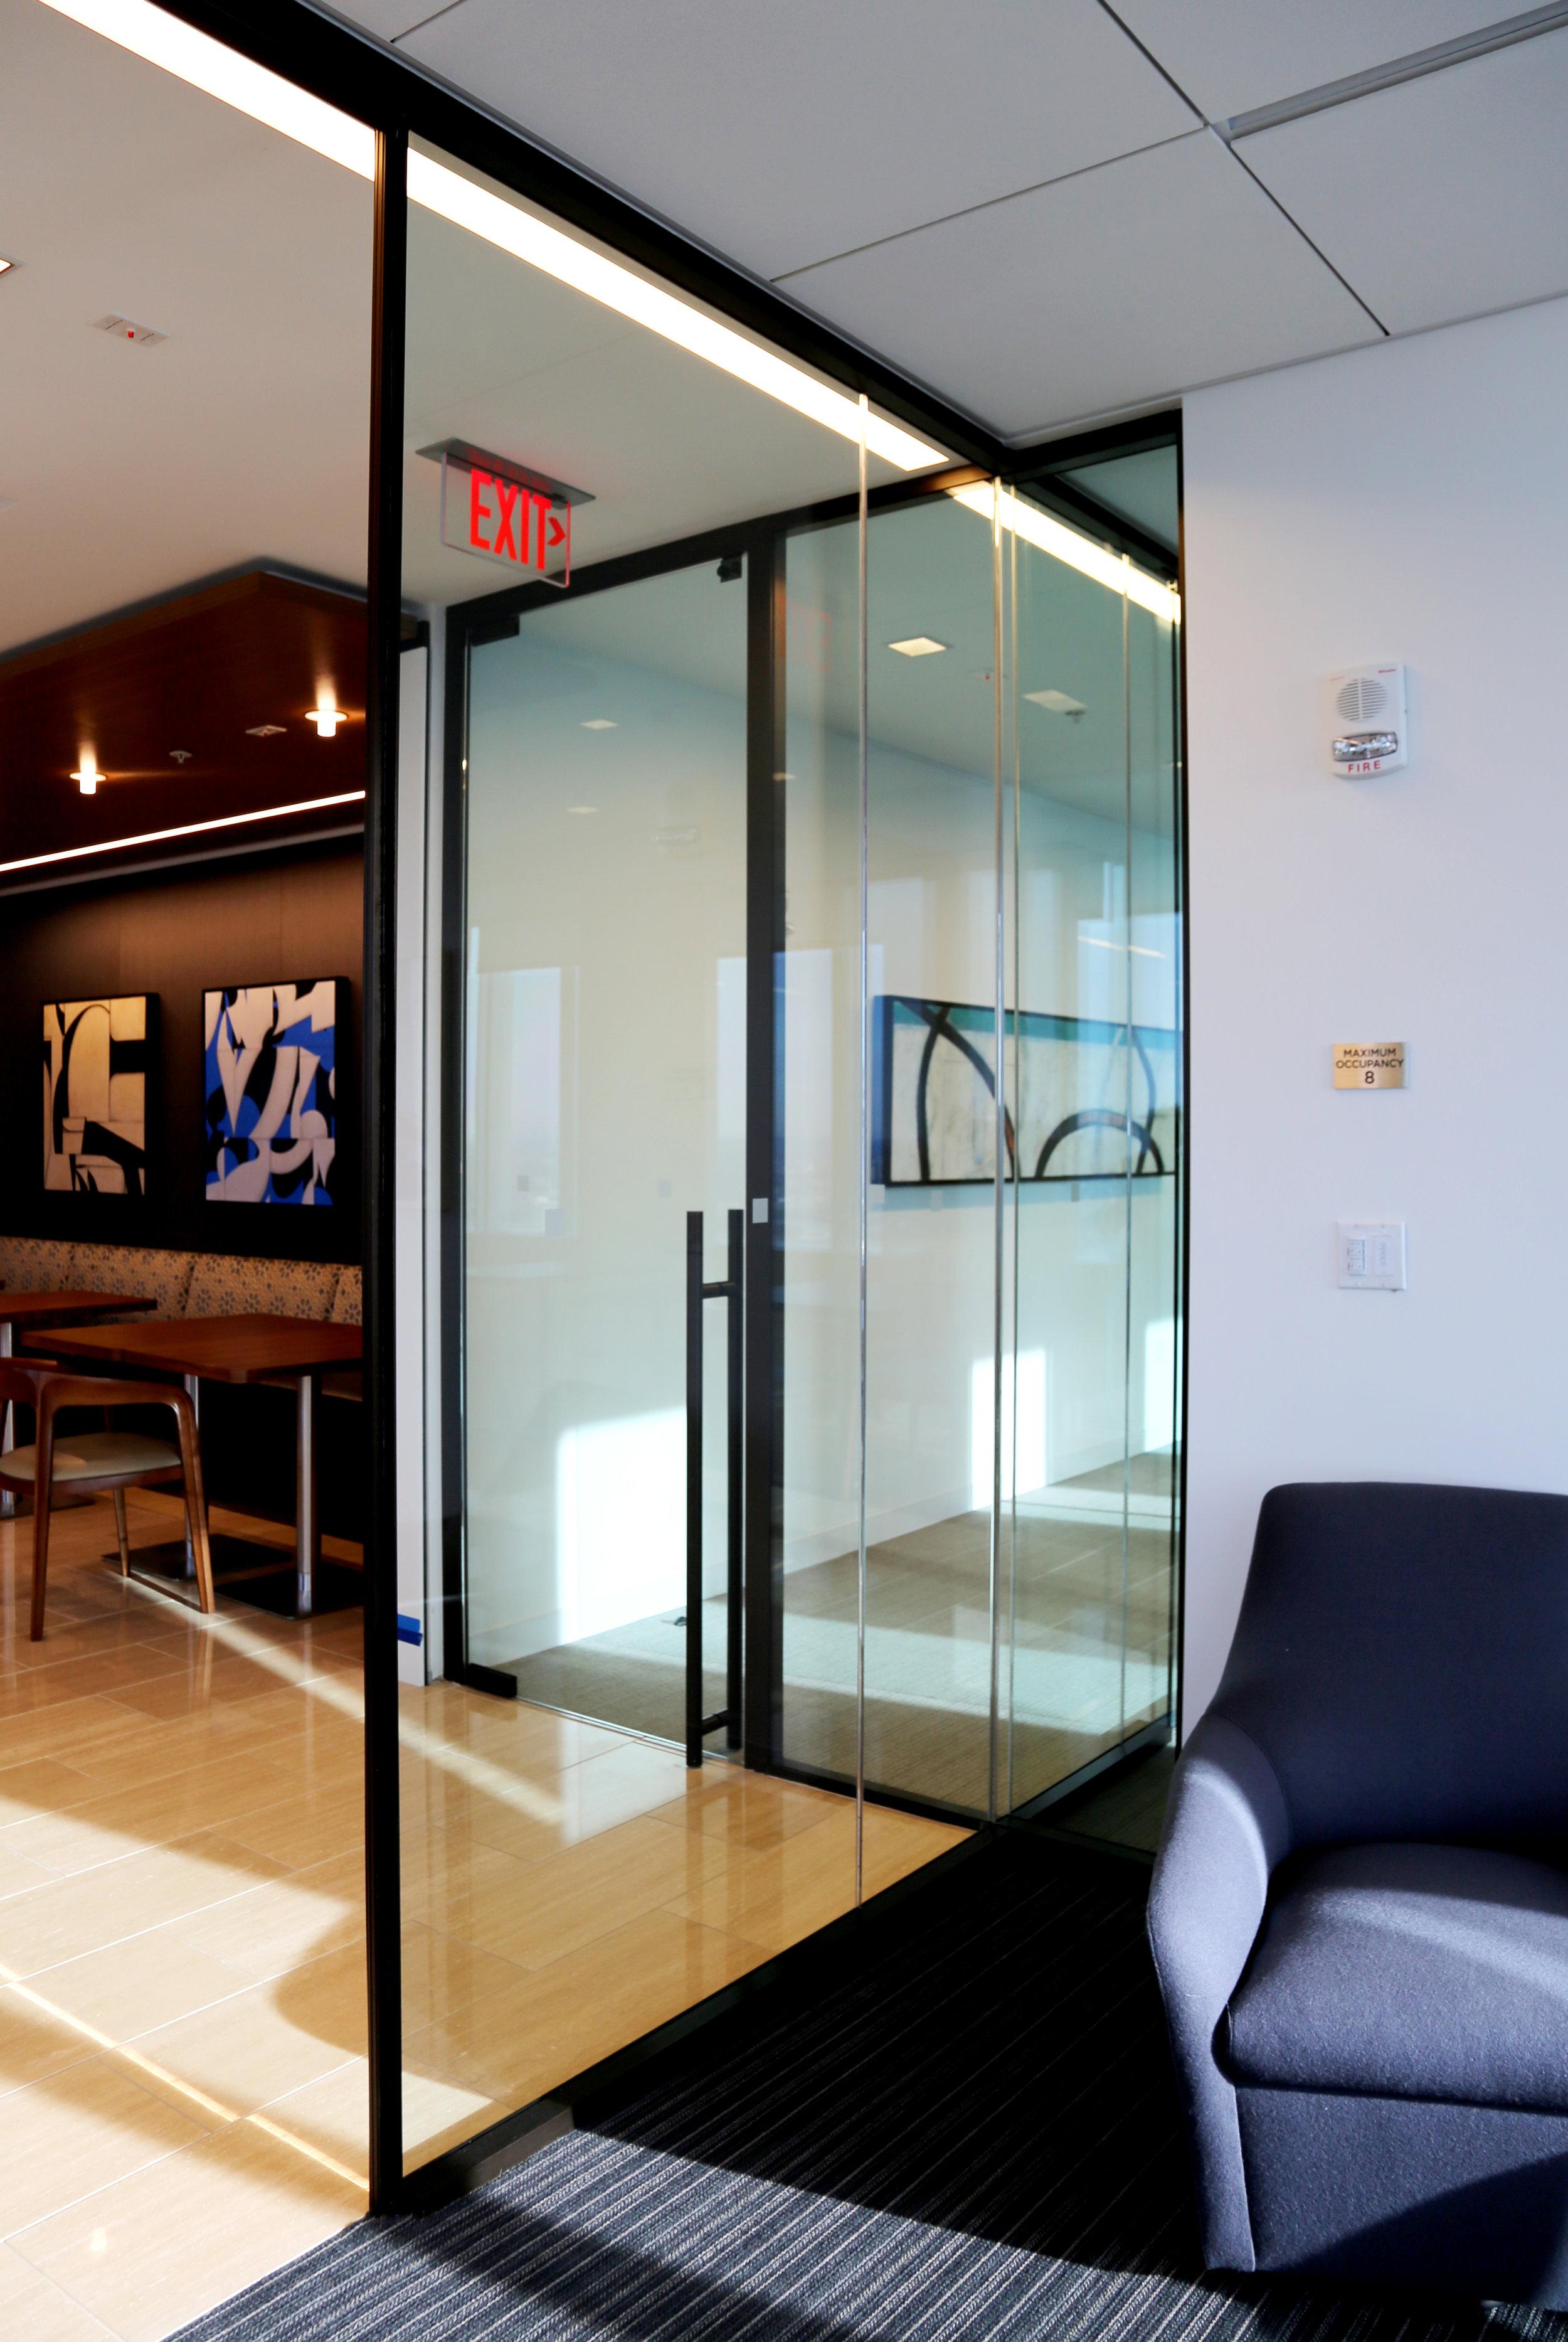 Modernus Butt Glazed Glass Huddle Room Wall - Spaceworks AI.jpg